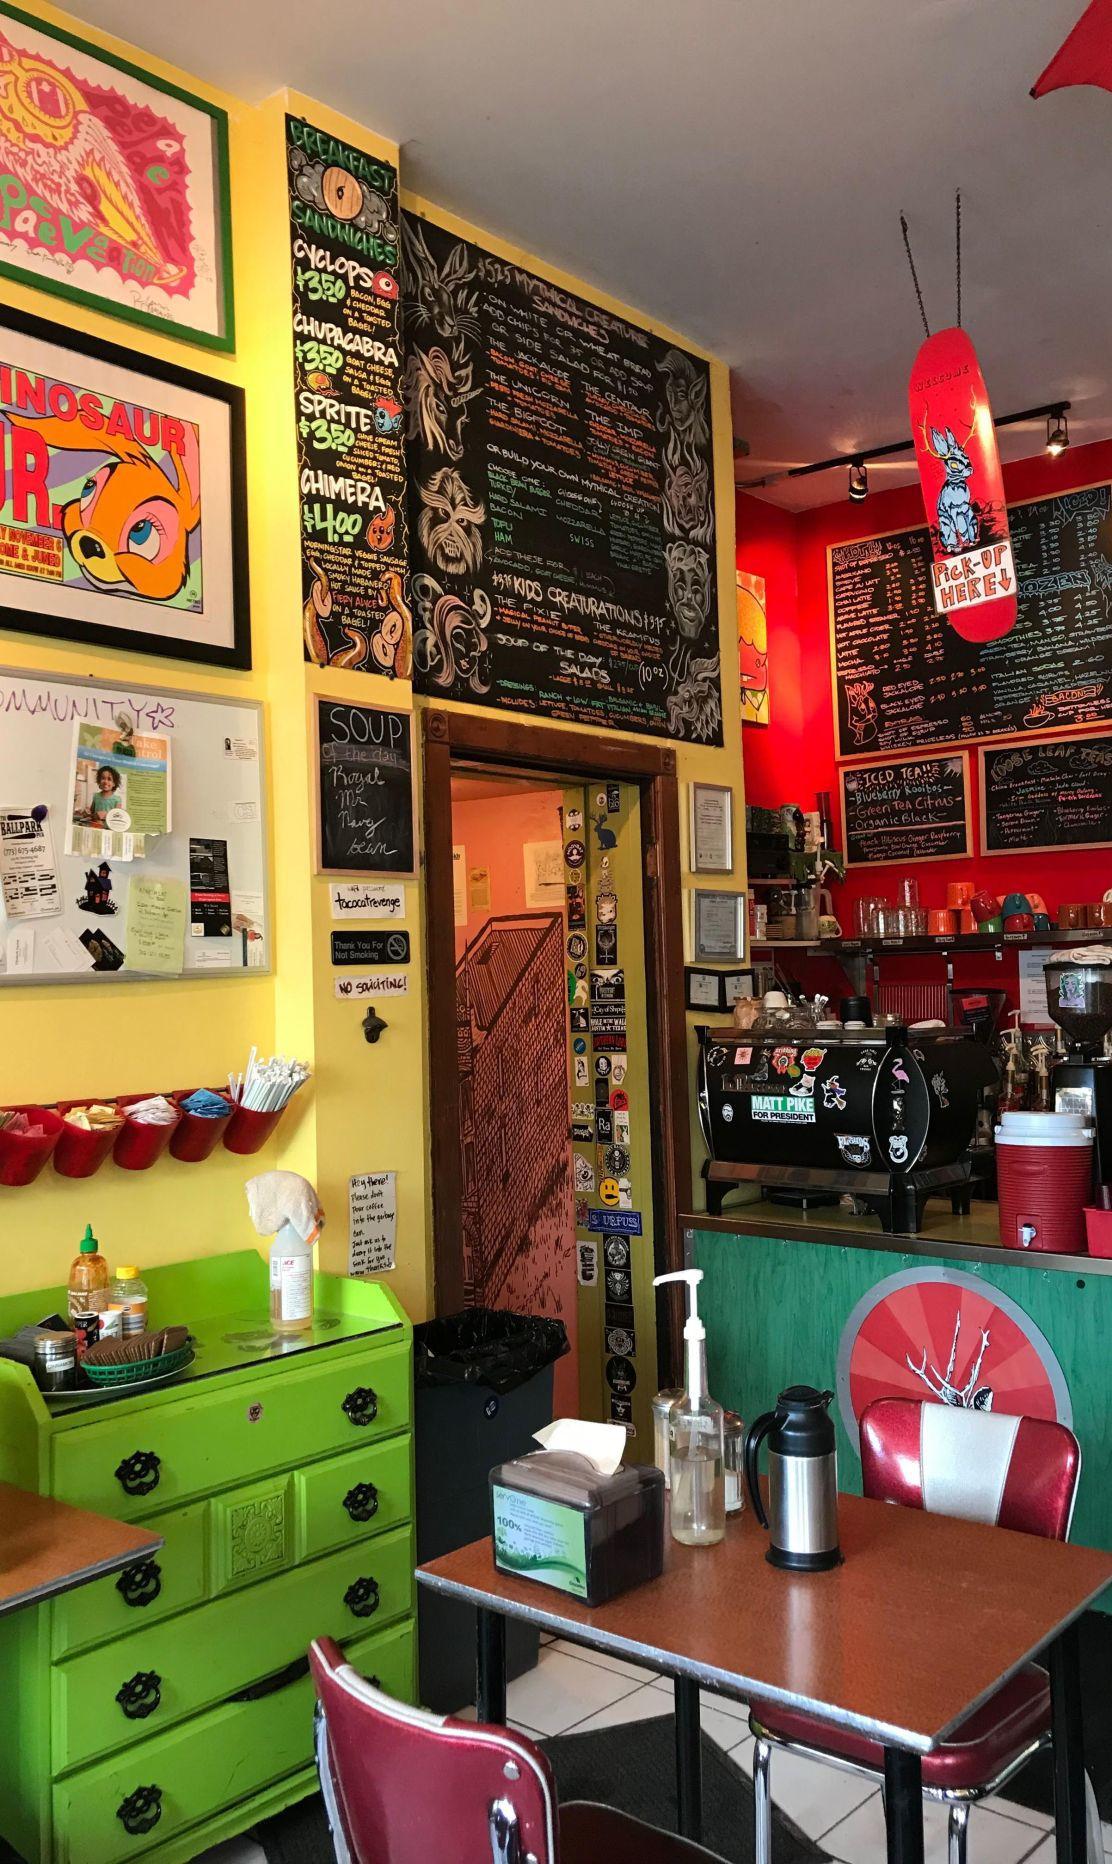 Take a foodie field trip to Chicago's Bridgeport neighborhood